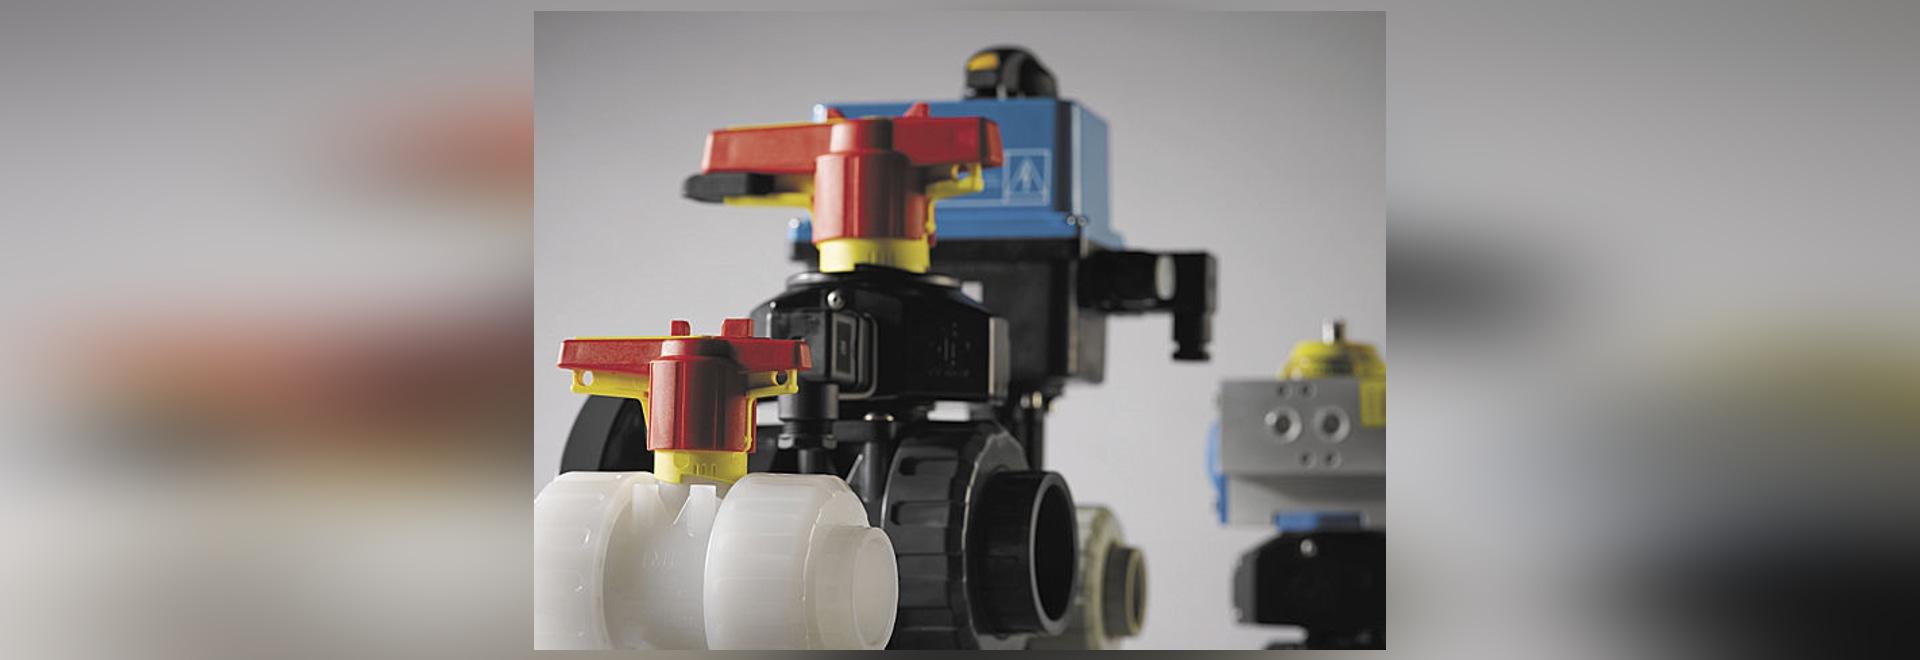 Complete Series M1 Modular Industrial Ball Valve